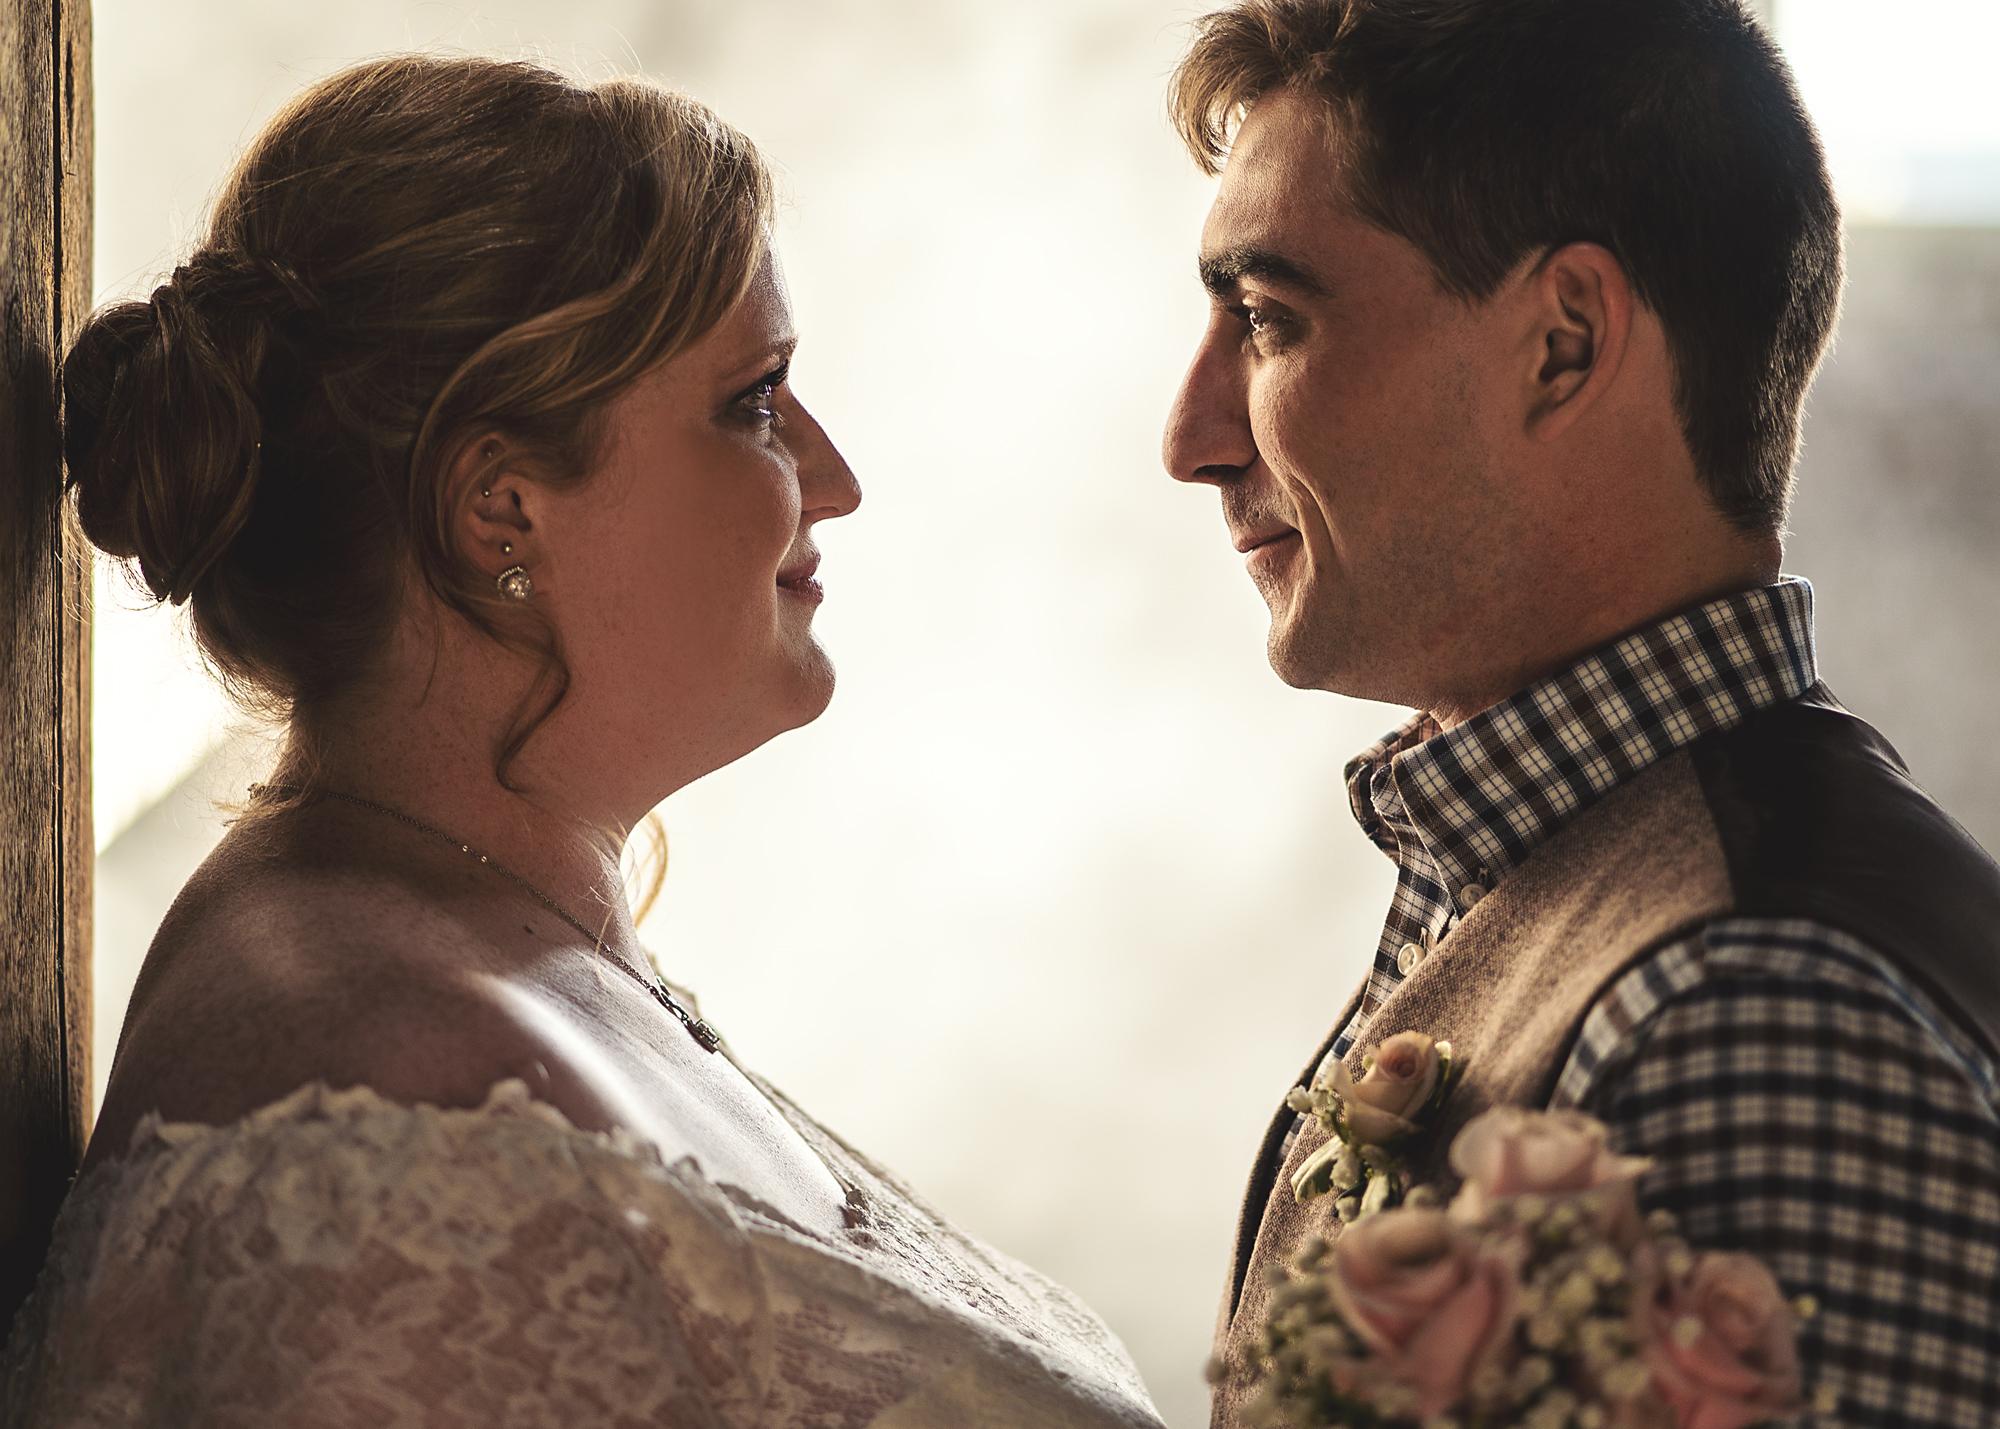 Muhlhauser-Barn-Wedding-Photos-8.jpg